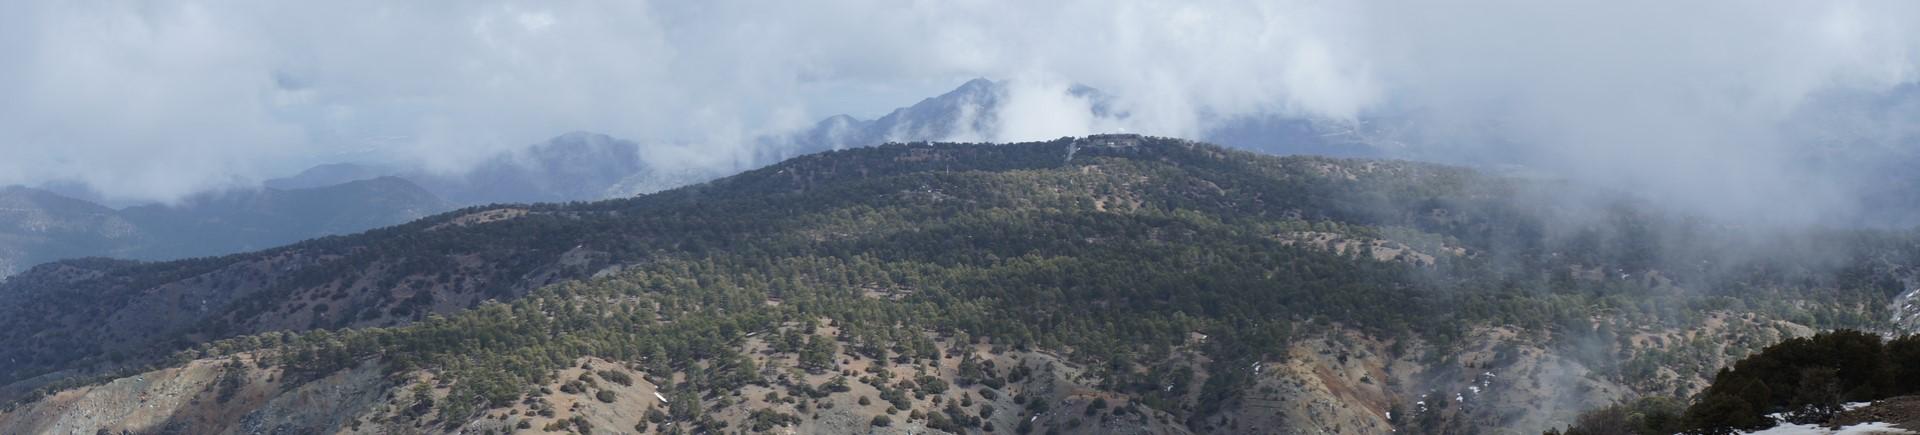 Widok zMt. Olympus 1952 m npm - Cypr